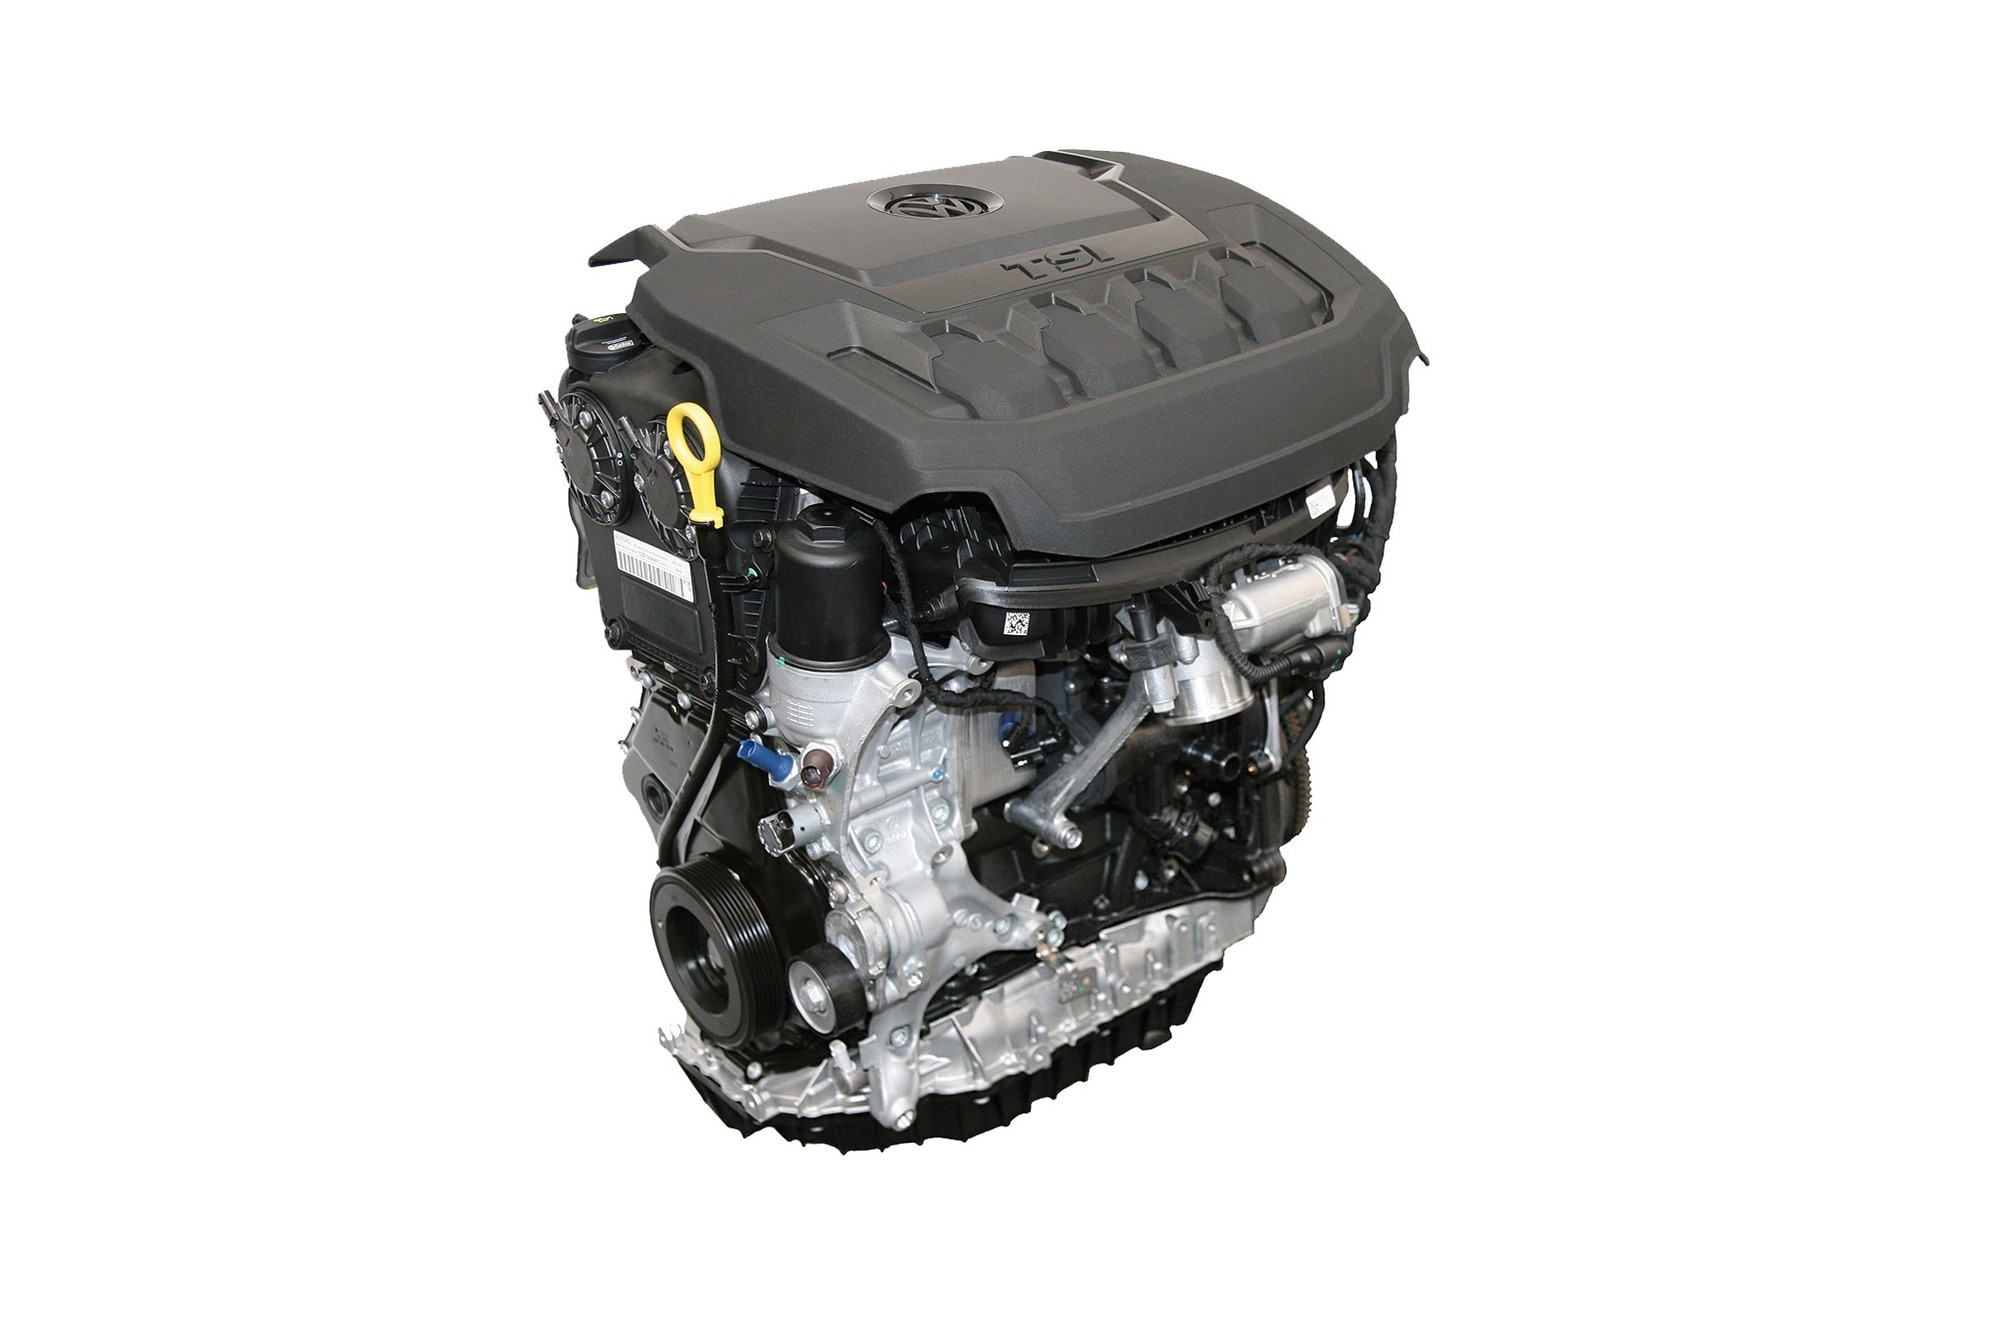 2010 Audi A4 2 0t Engine Diagram Trusted Wiring Diagrams Vw 0 Tfsi Enthusiast U2022 B7 Vacuum Line Located